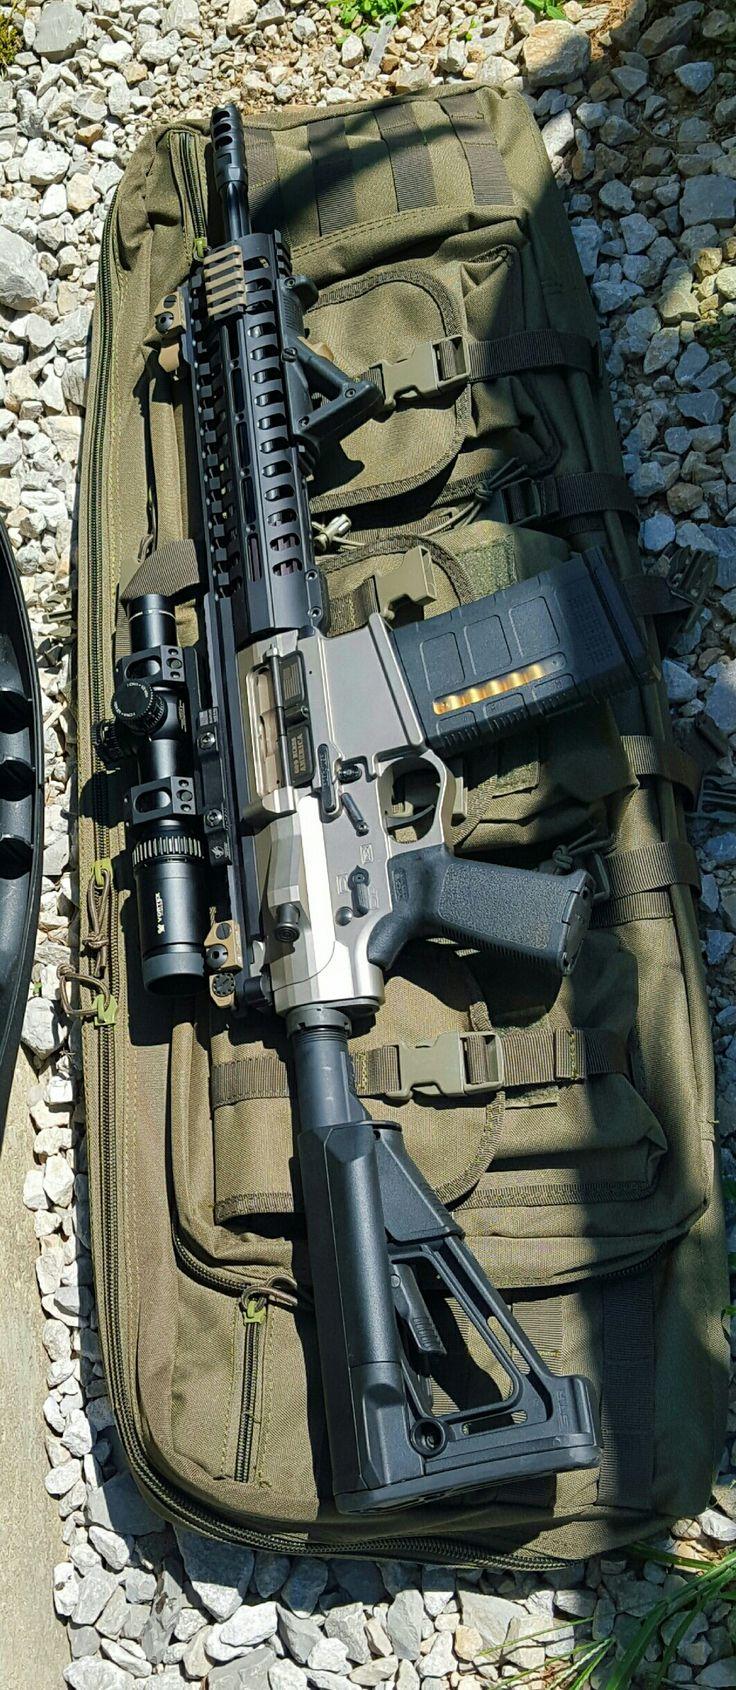 Patriot Ordinance P308